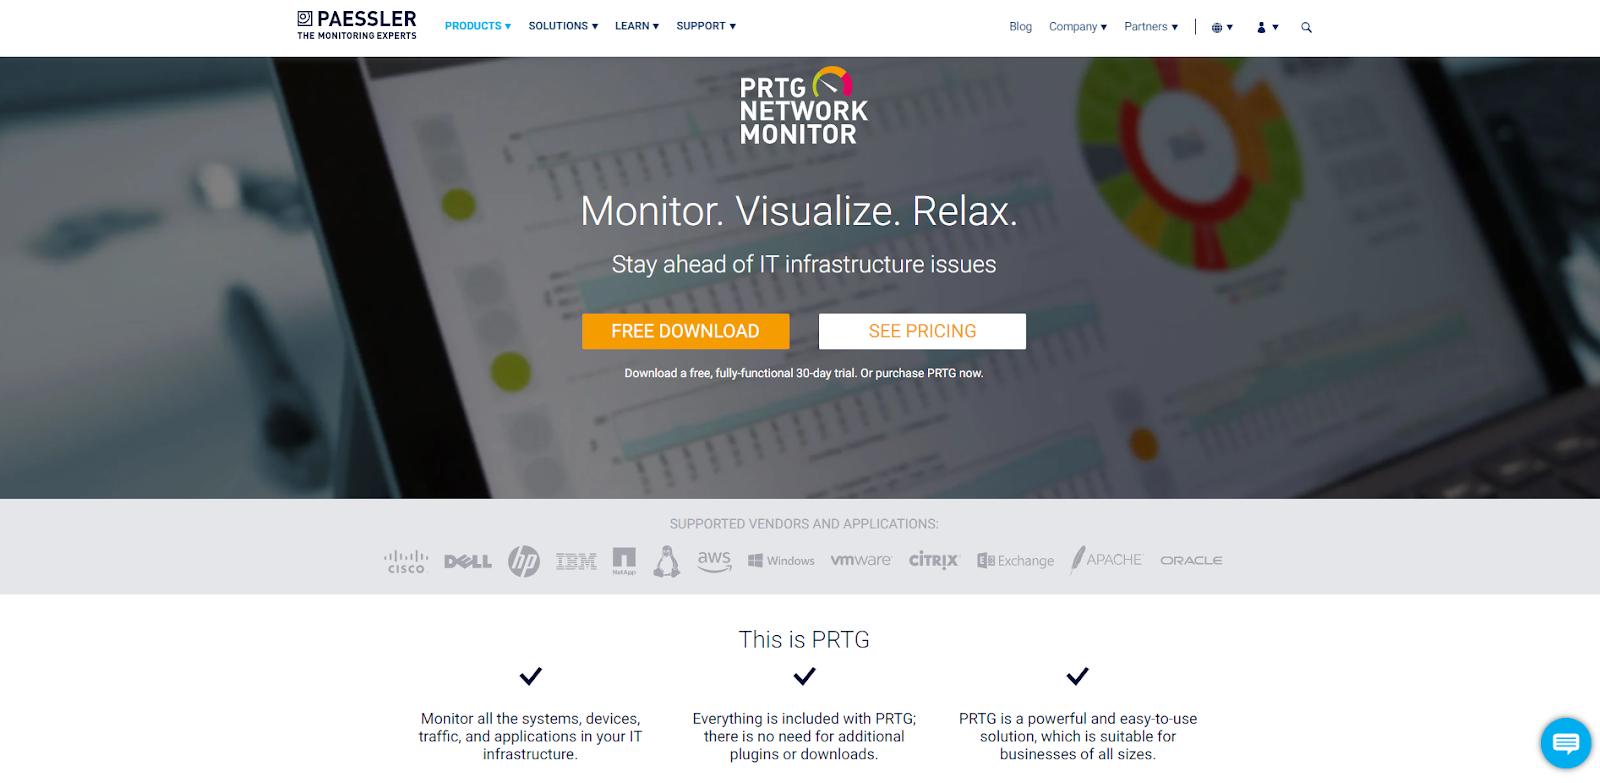 Paessler PRTG Network Monitoring Tools